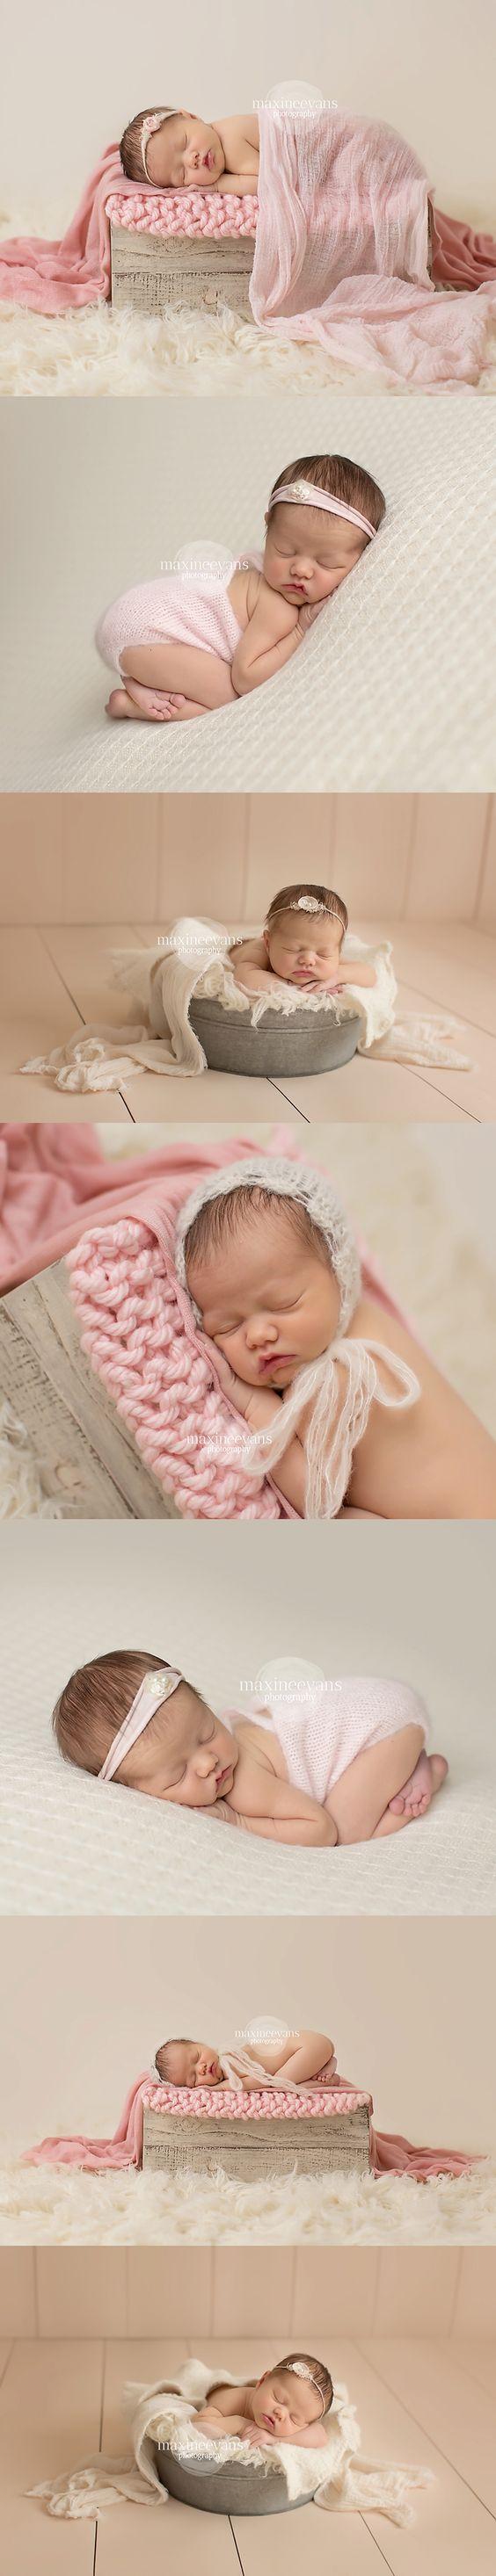 Gorgeous Newborn Baby Girl! Los Angeles Newborn Photographer